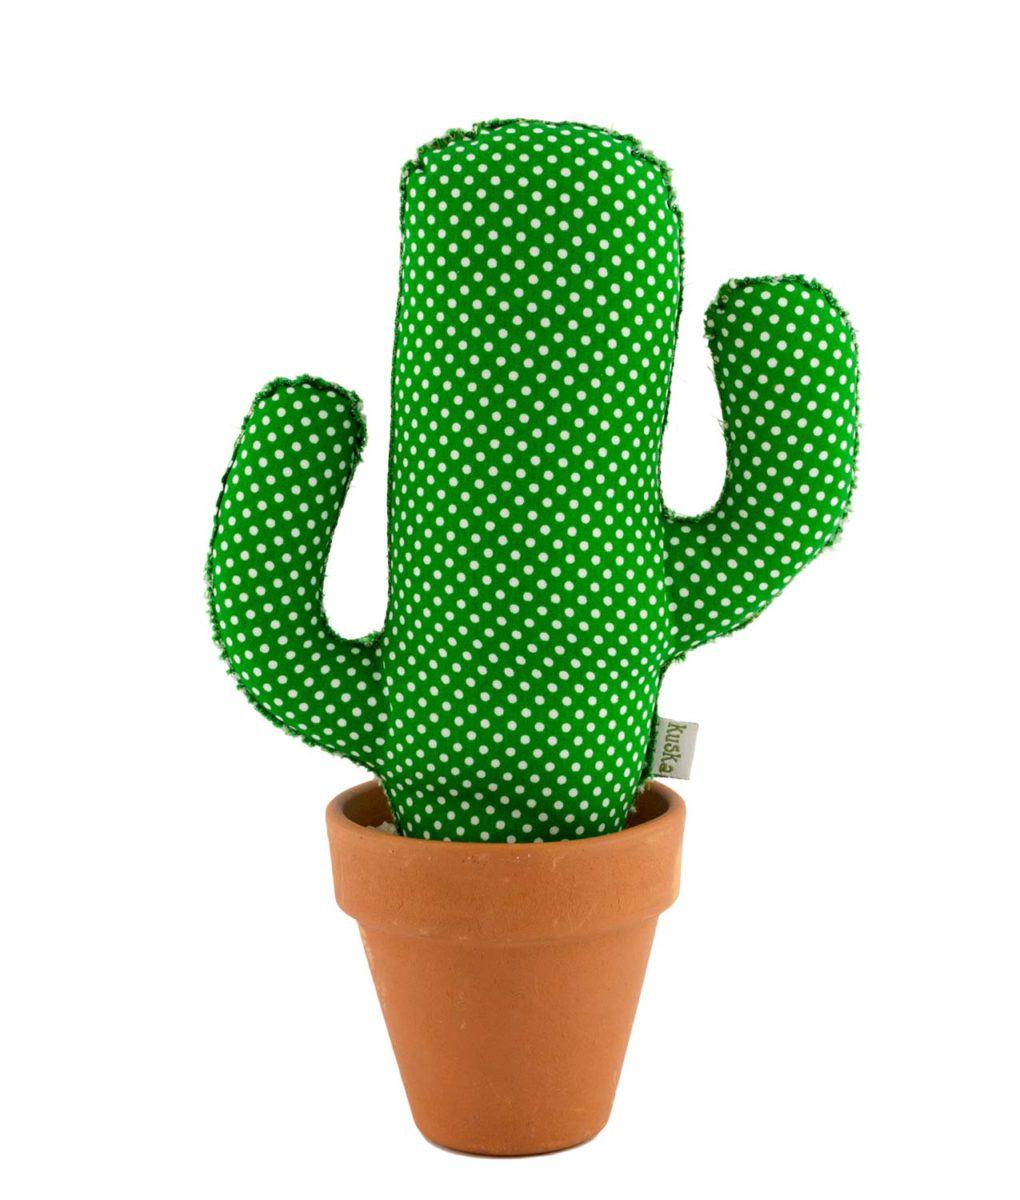 topos-pequenos-verdes-cactus-grande-kuska